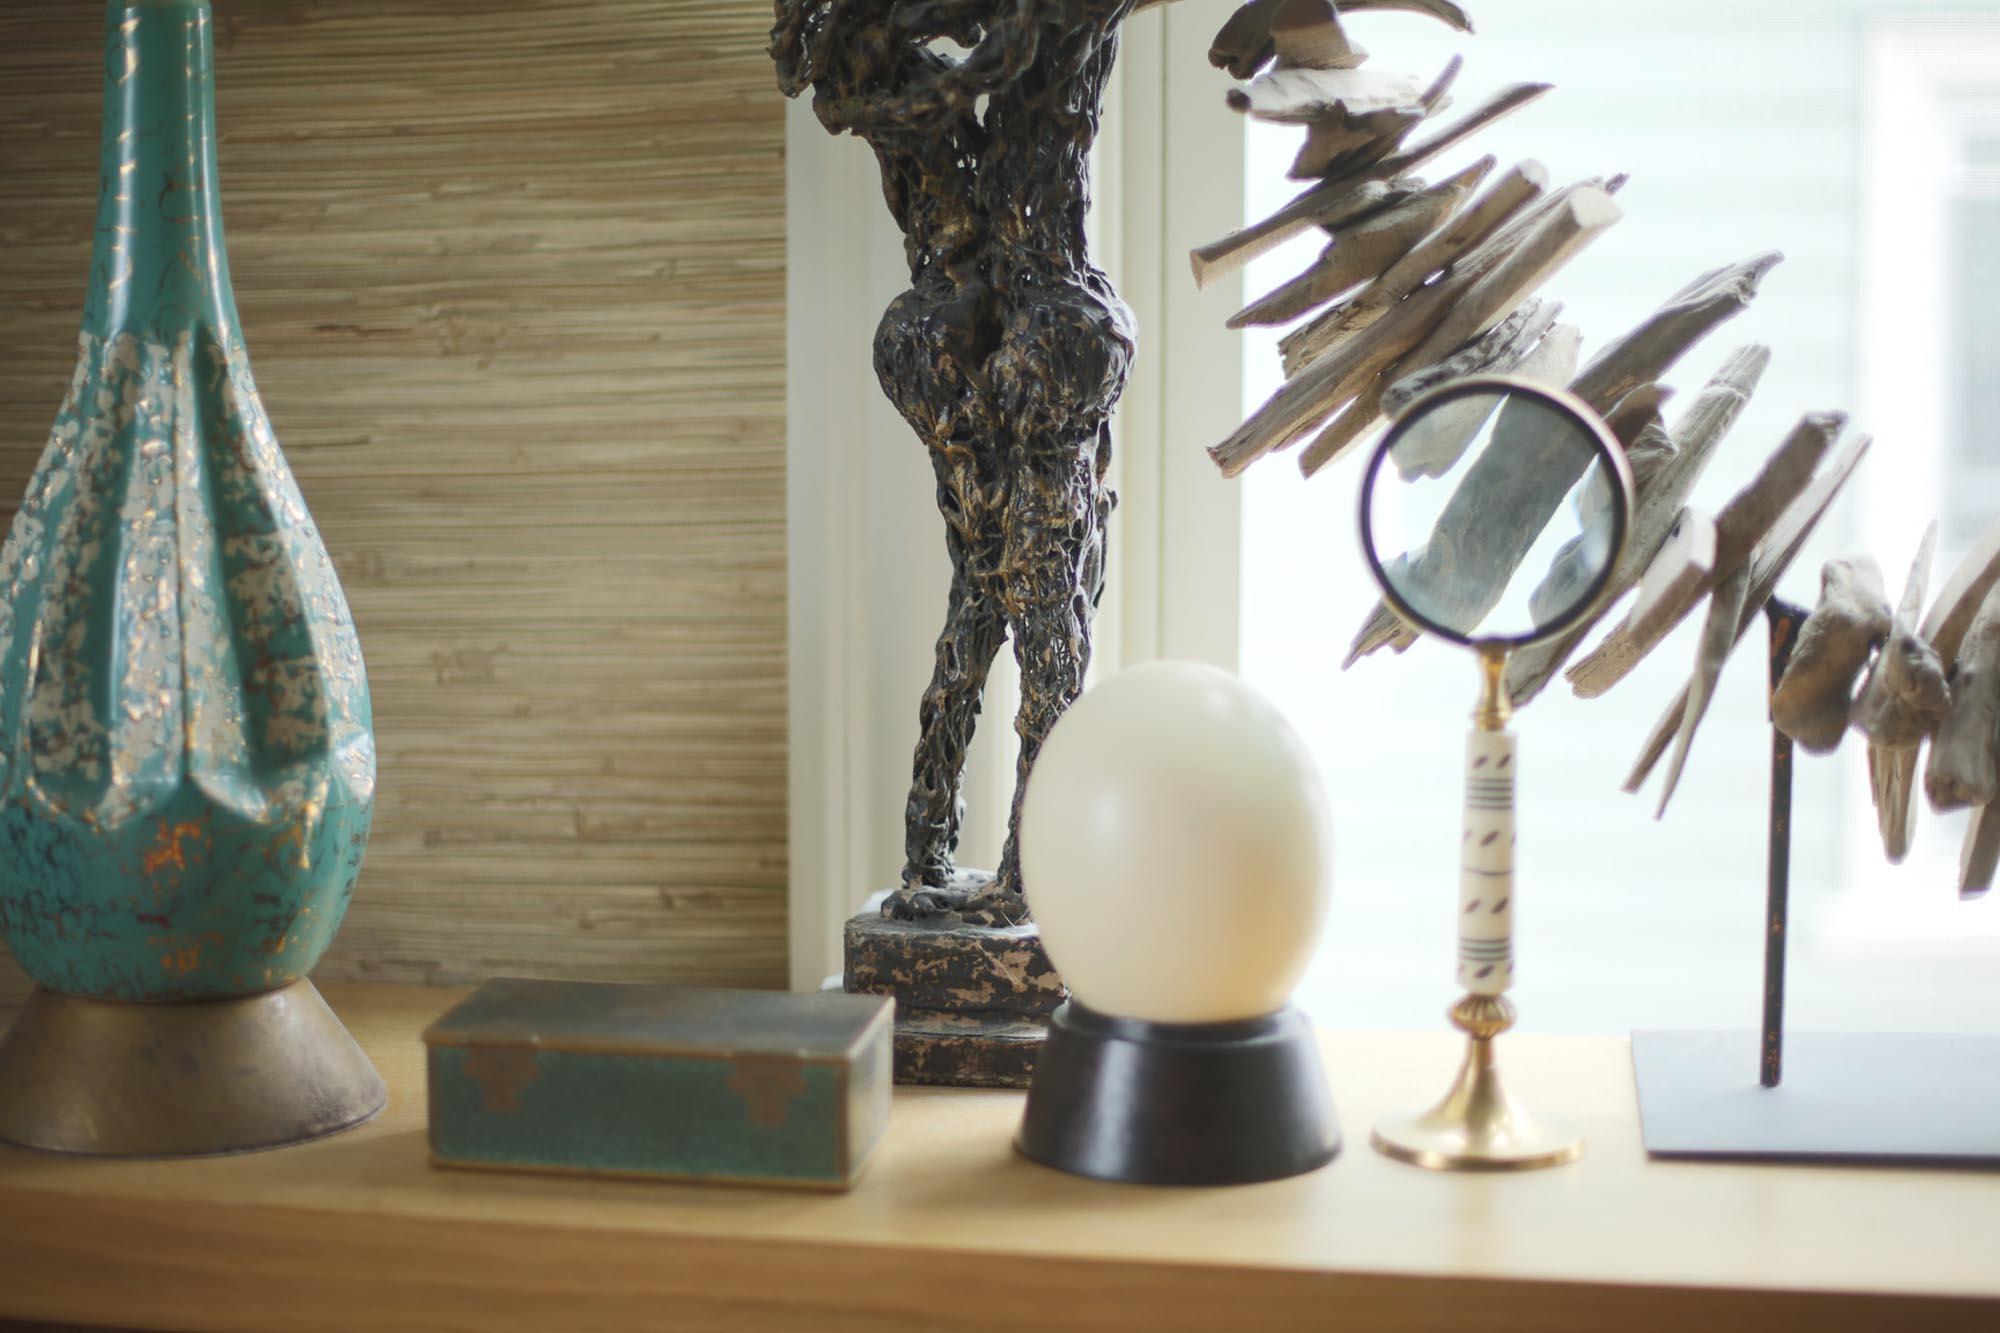 Sculptures resting on a fine wooden dresser